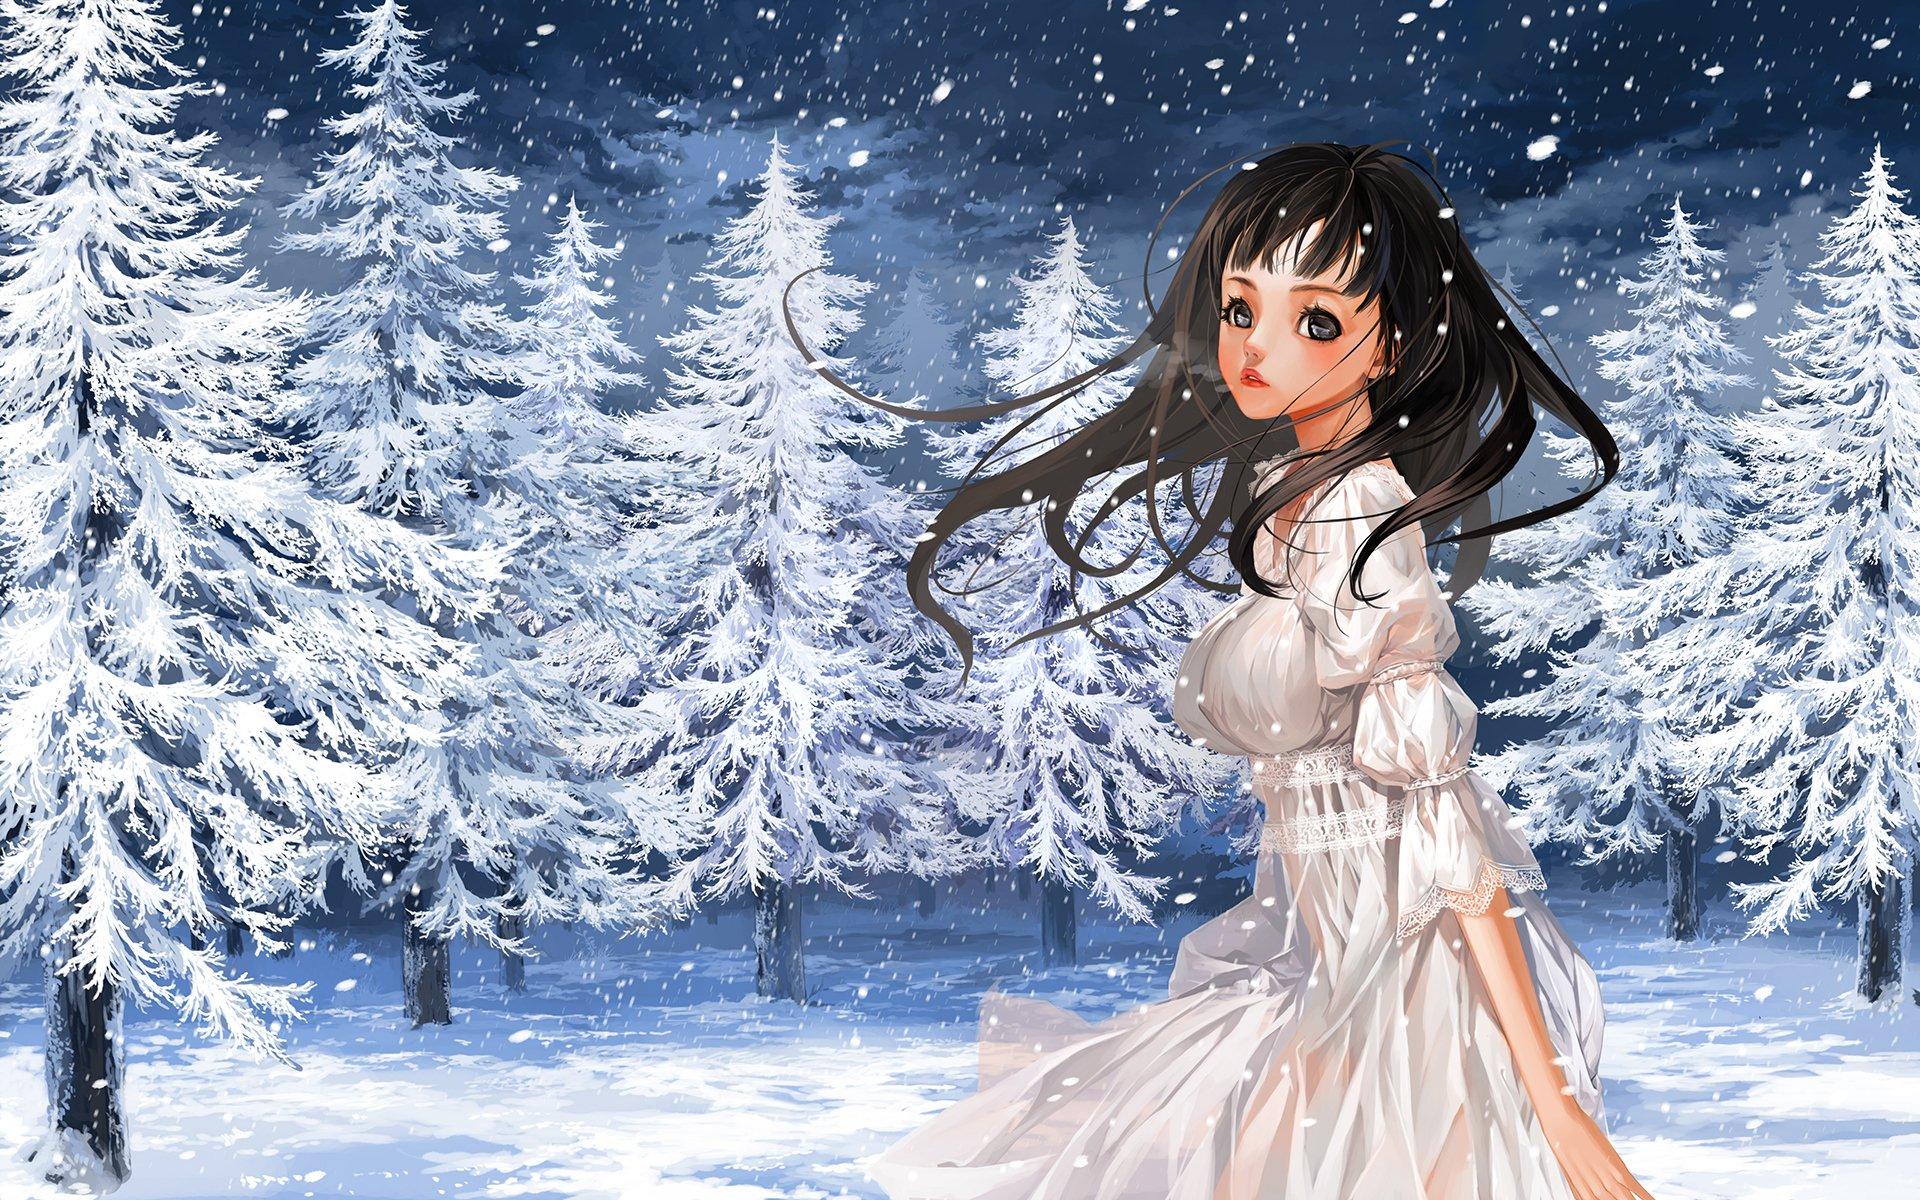 Anime girl in winter forest hd wallpaper hintergrund - Winter anime girl wallpaper ...